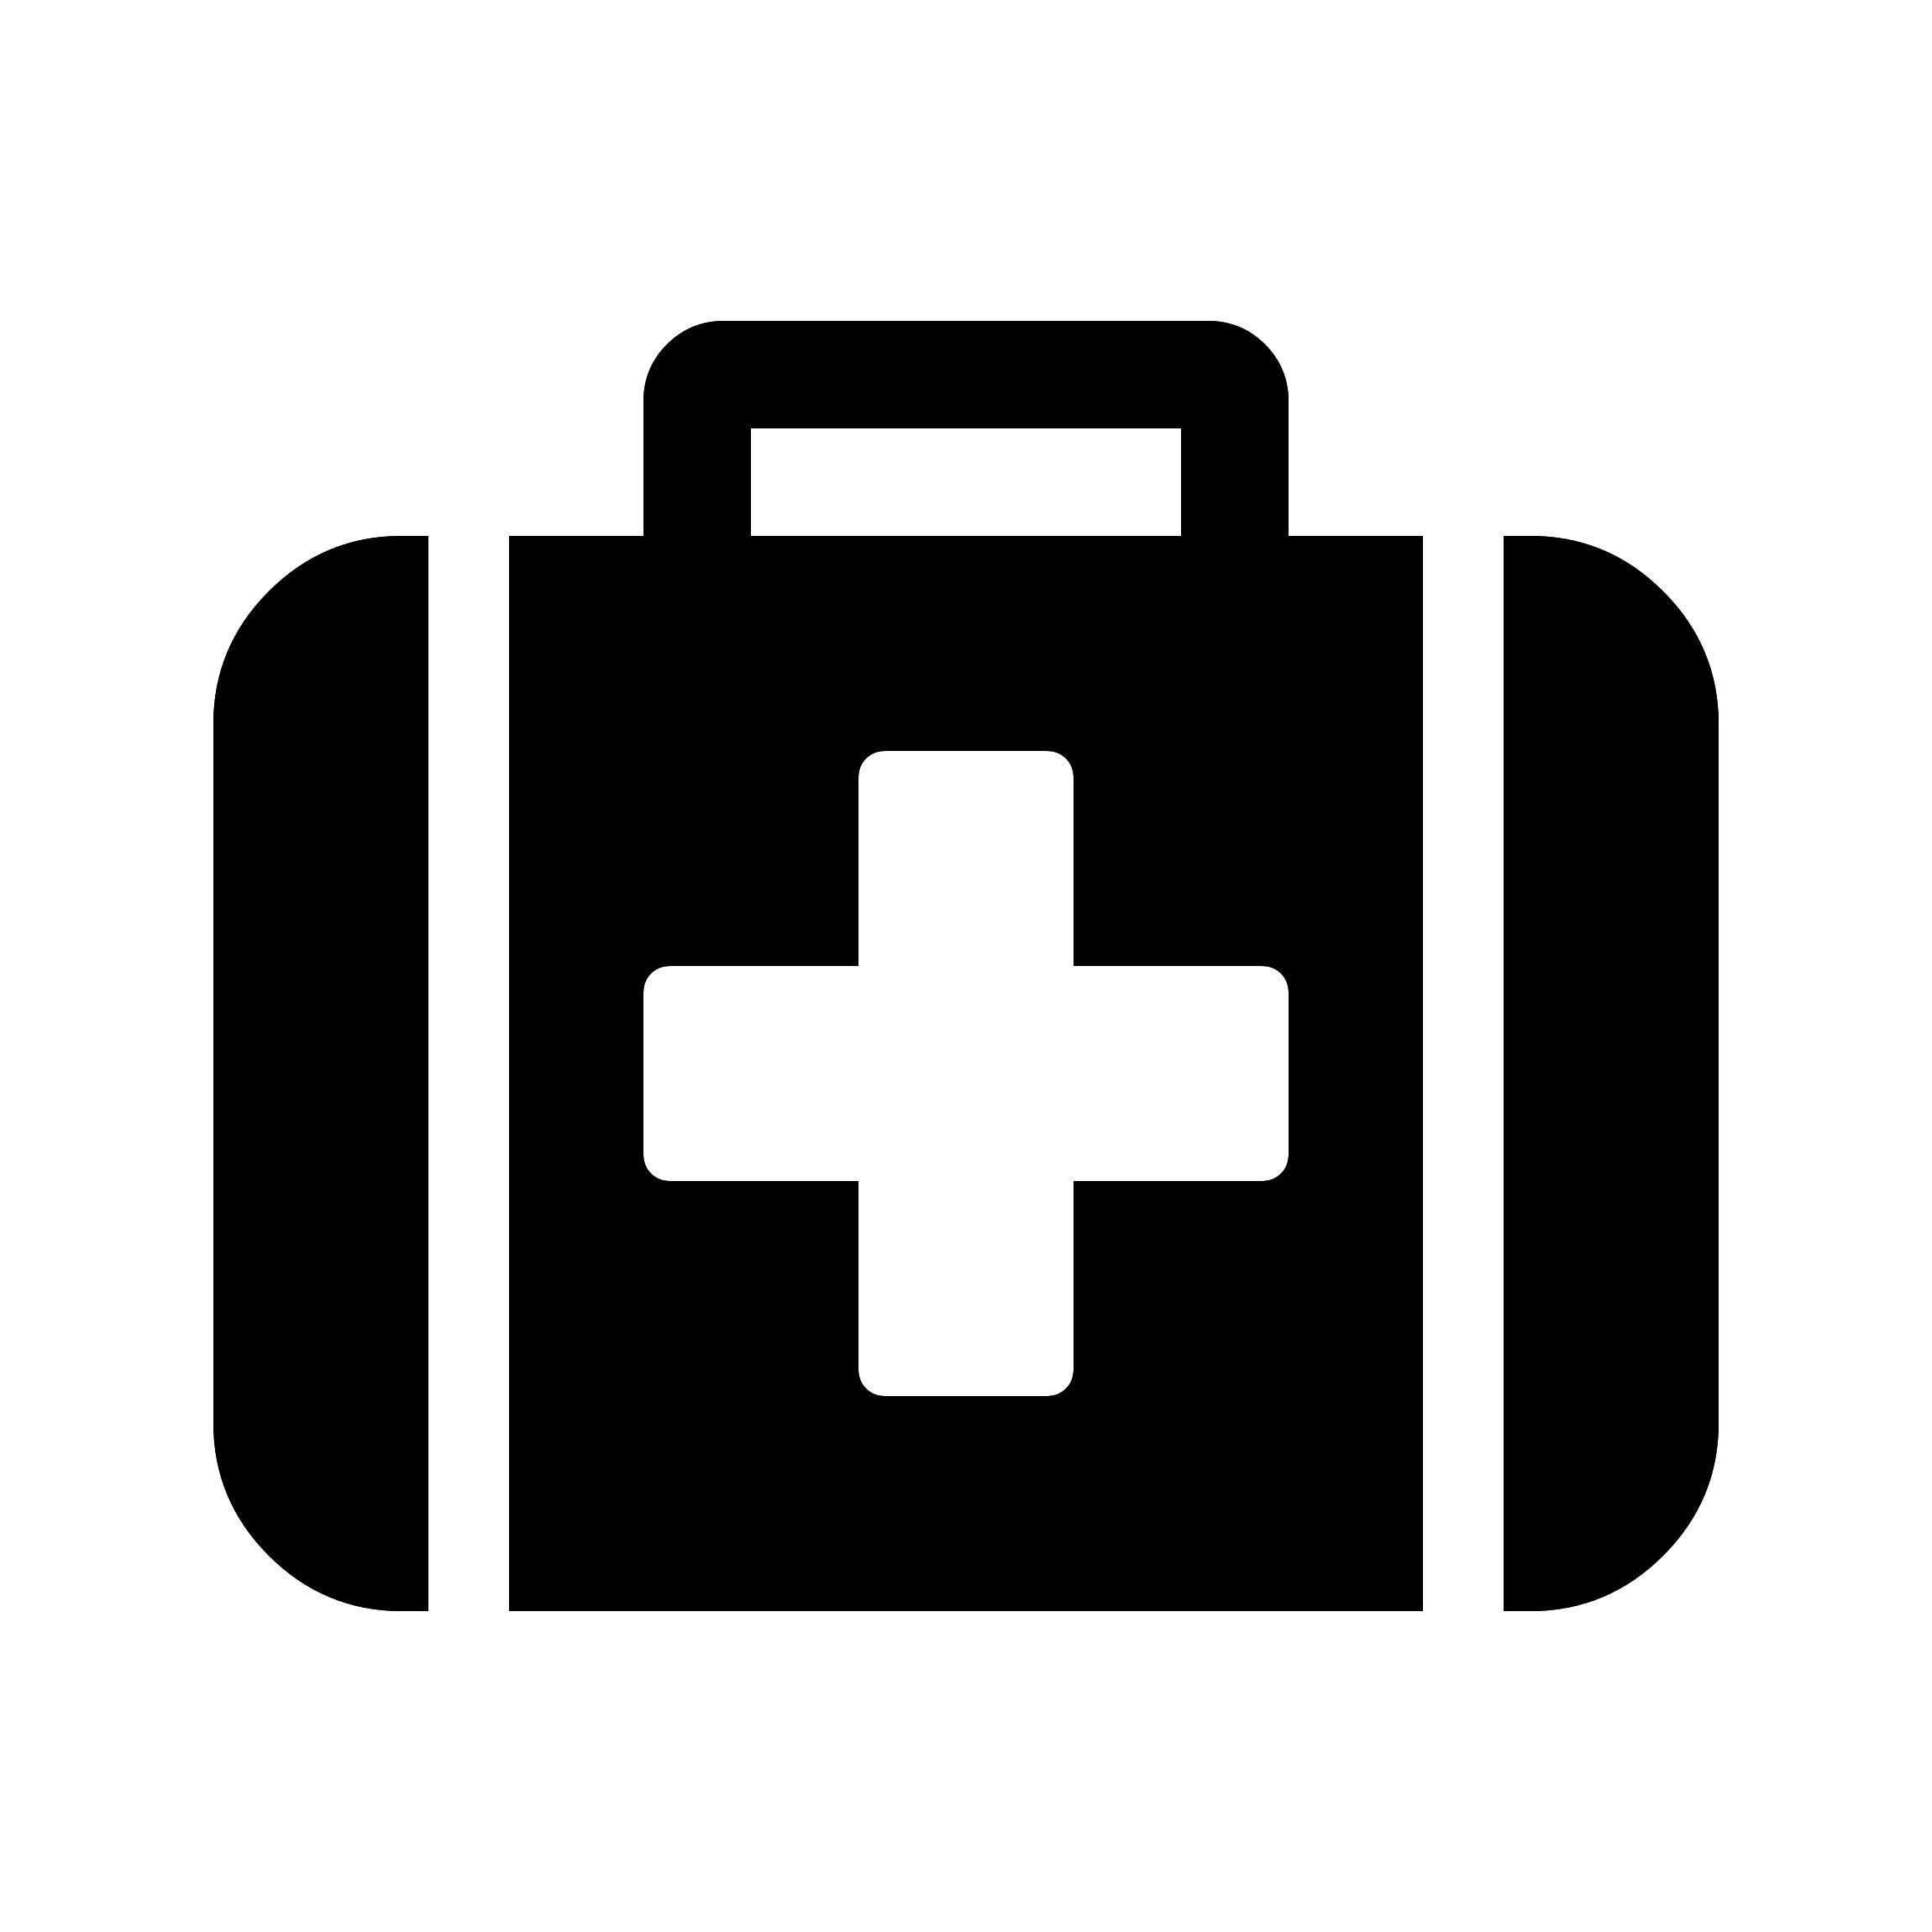 data/images/medkit.png